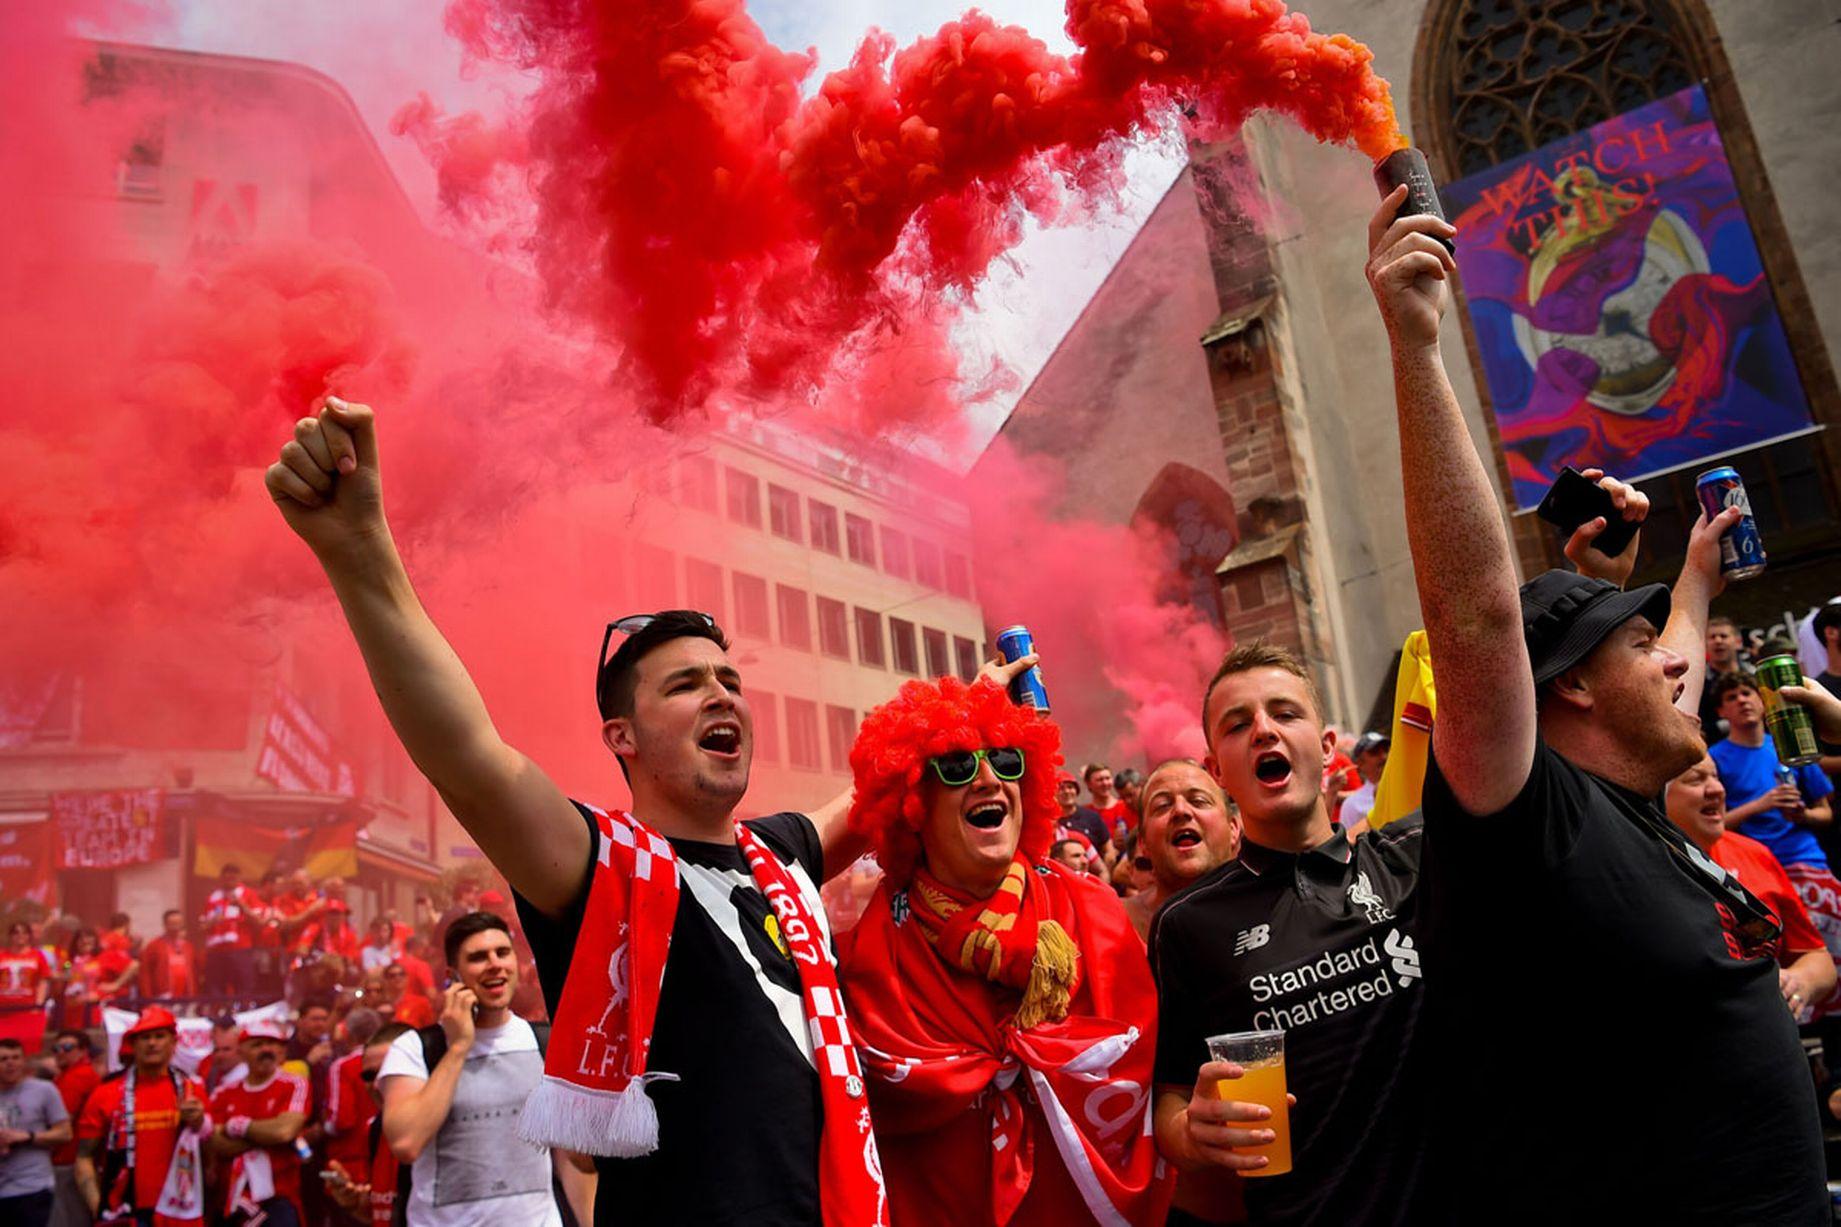 Liverpool fans celebrate/celebrating